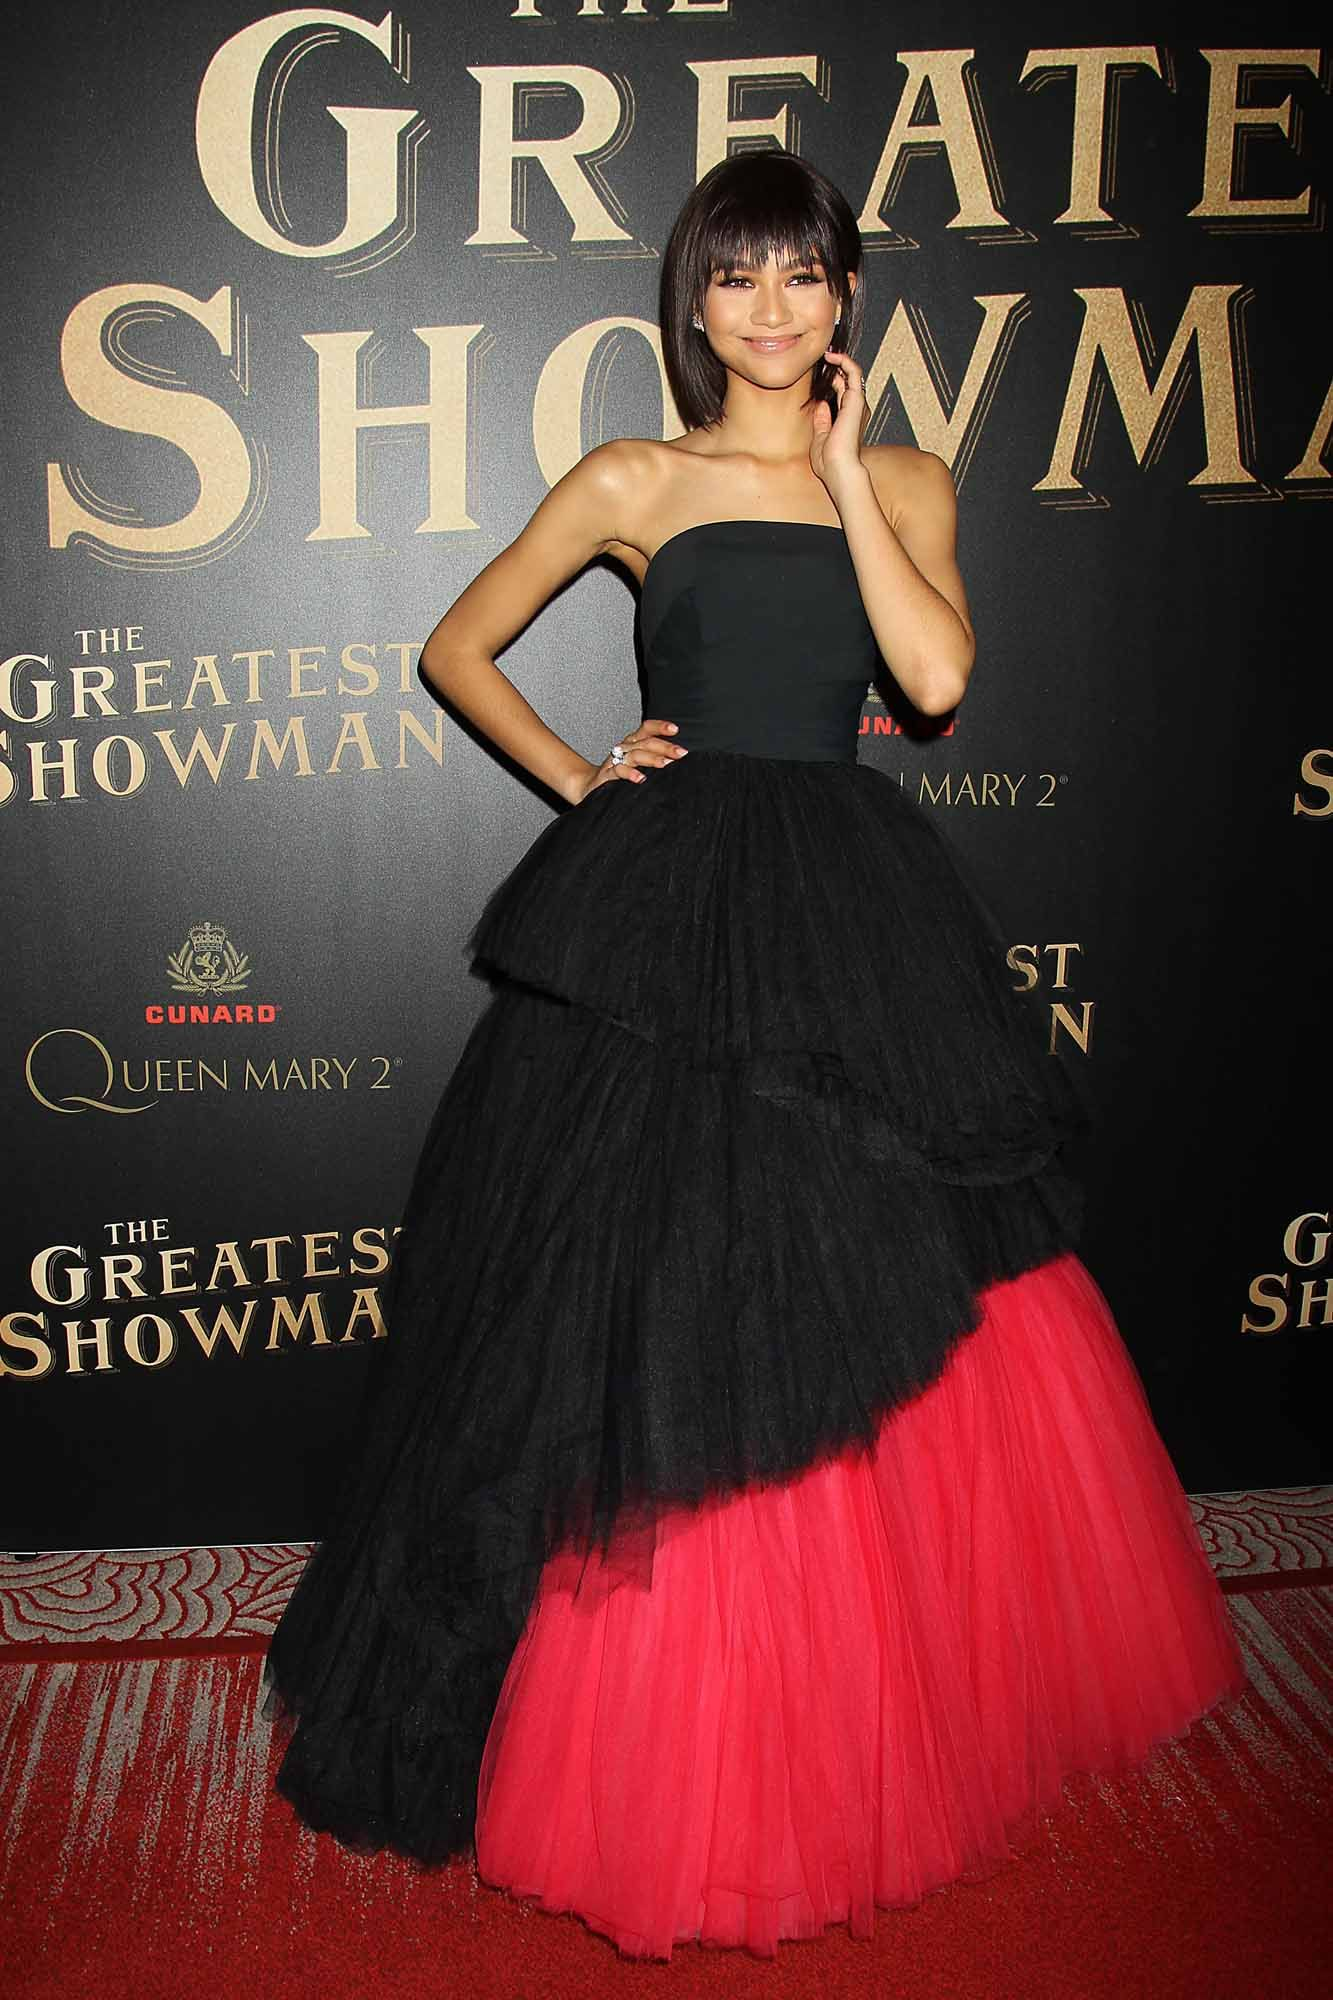 Zendaya Puffy Sleeves Red Dress